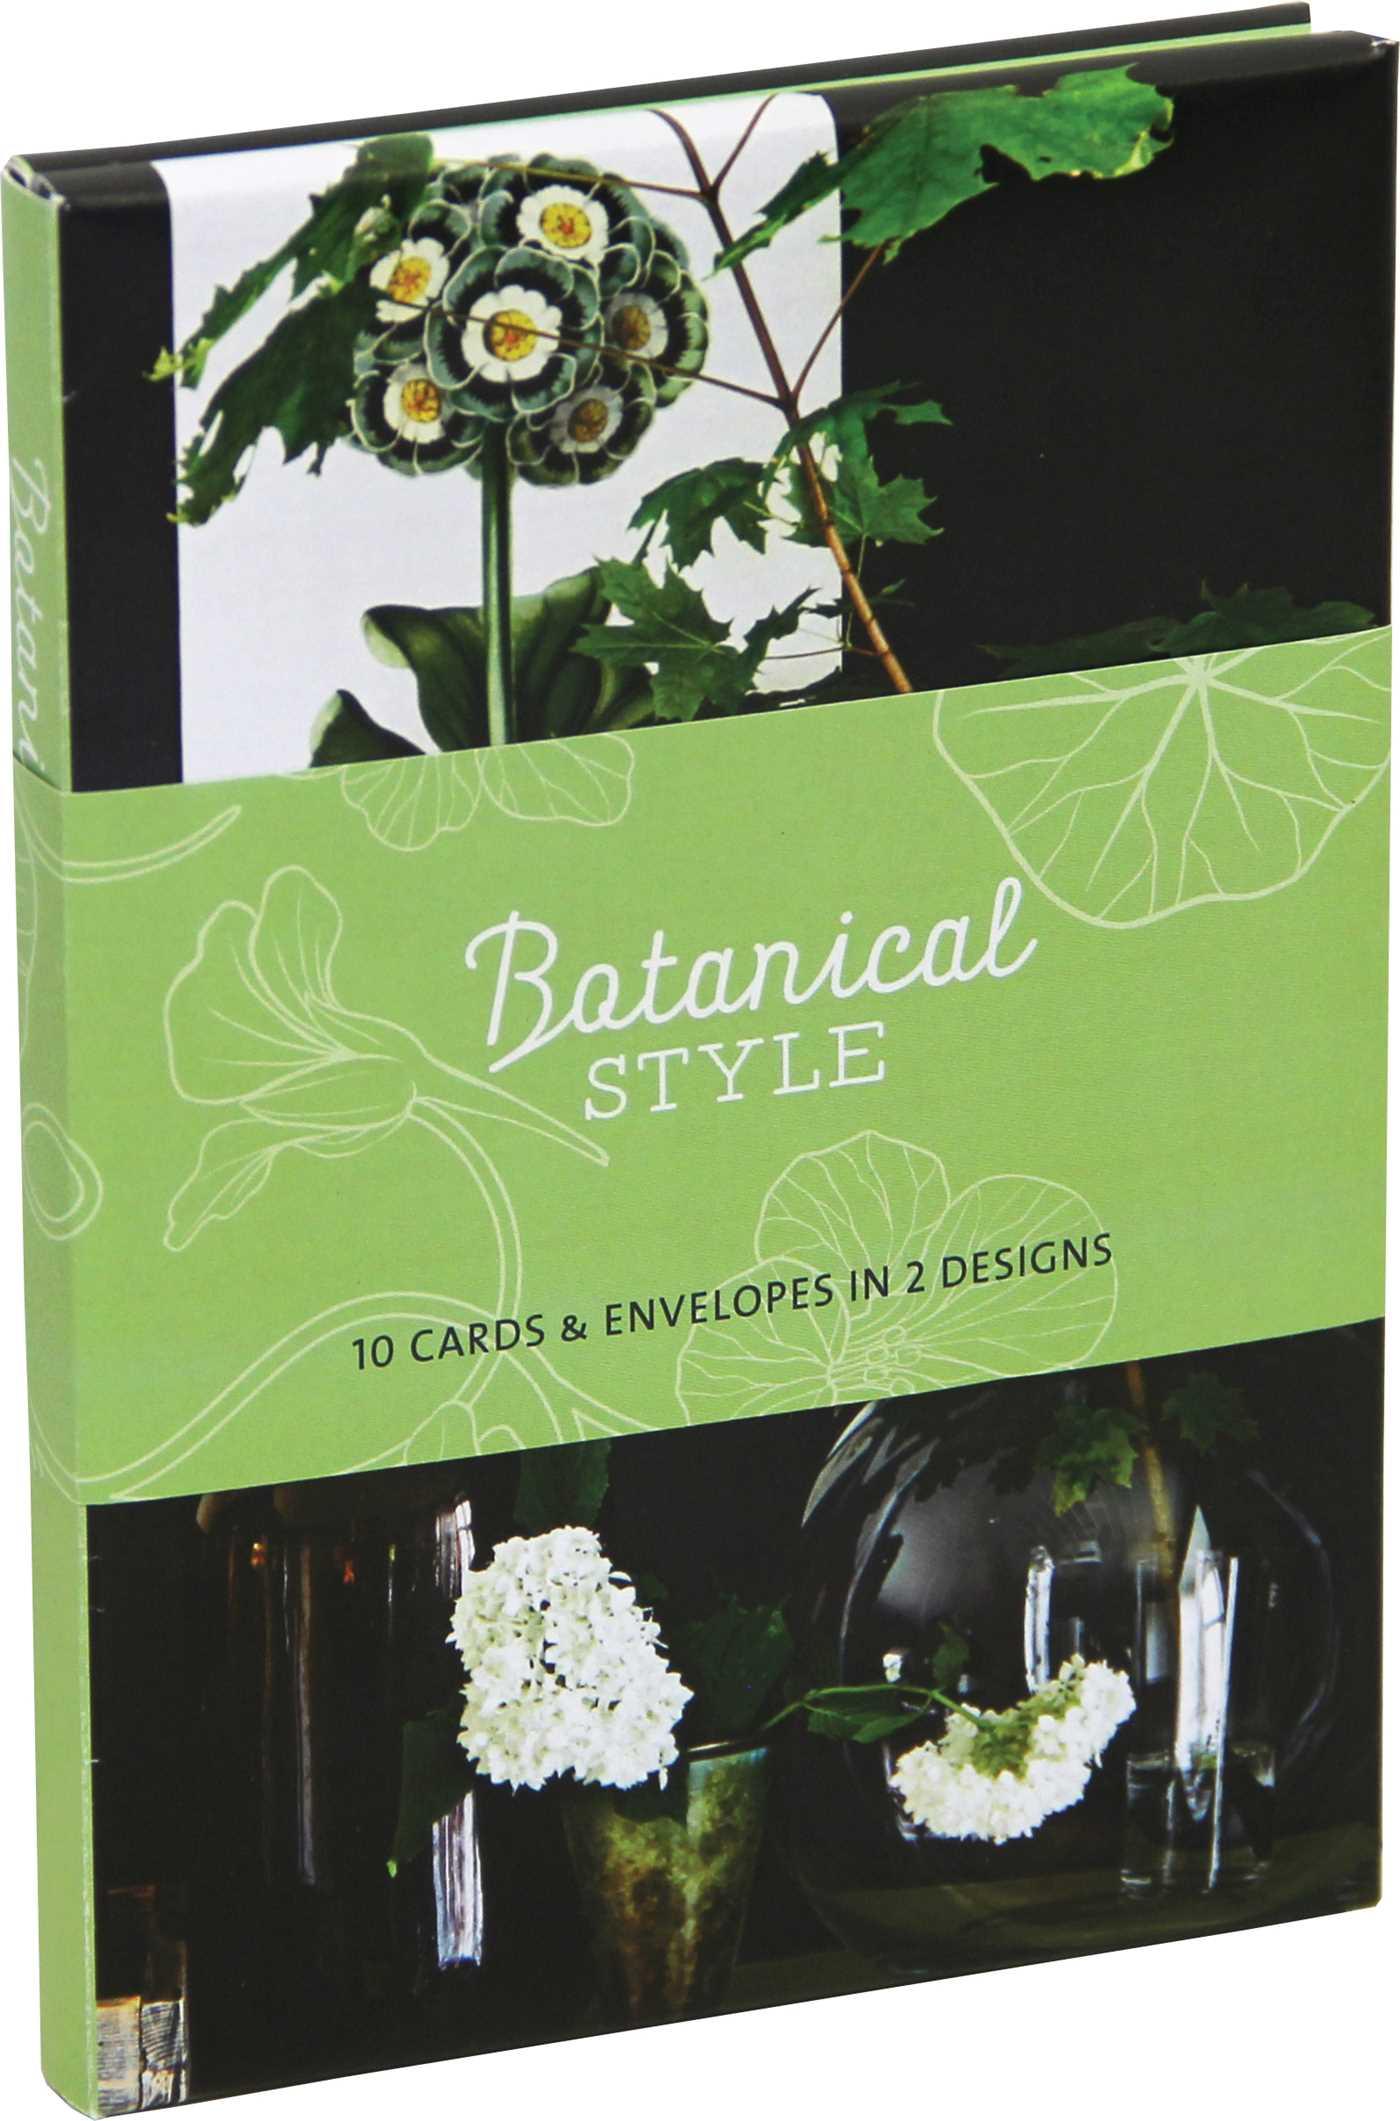 Botanical style wallet notecards 9781849759465 hr